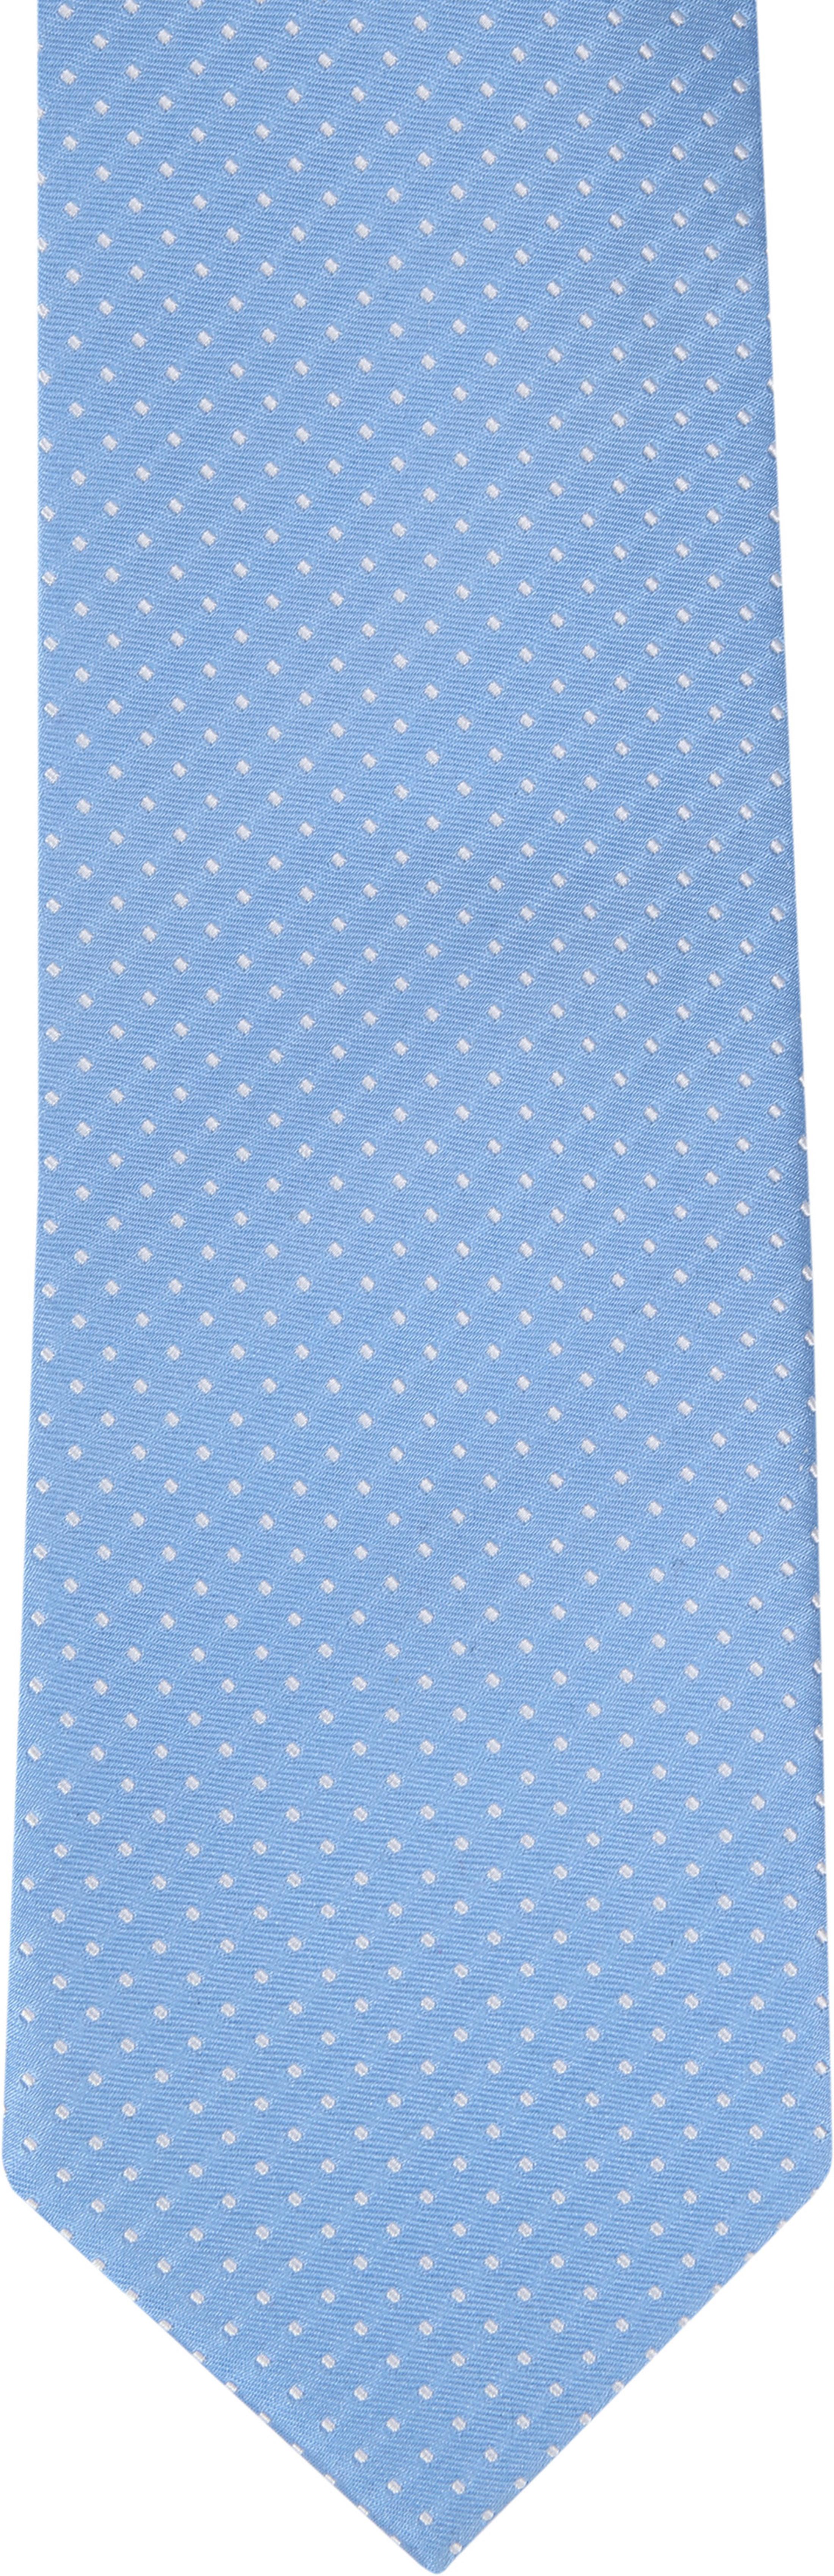 Suitable Krawatte Seide Blau F91-7 foto 1